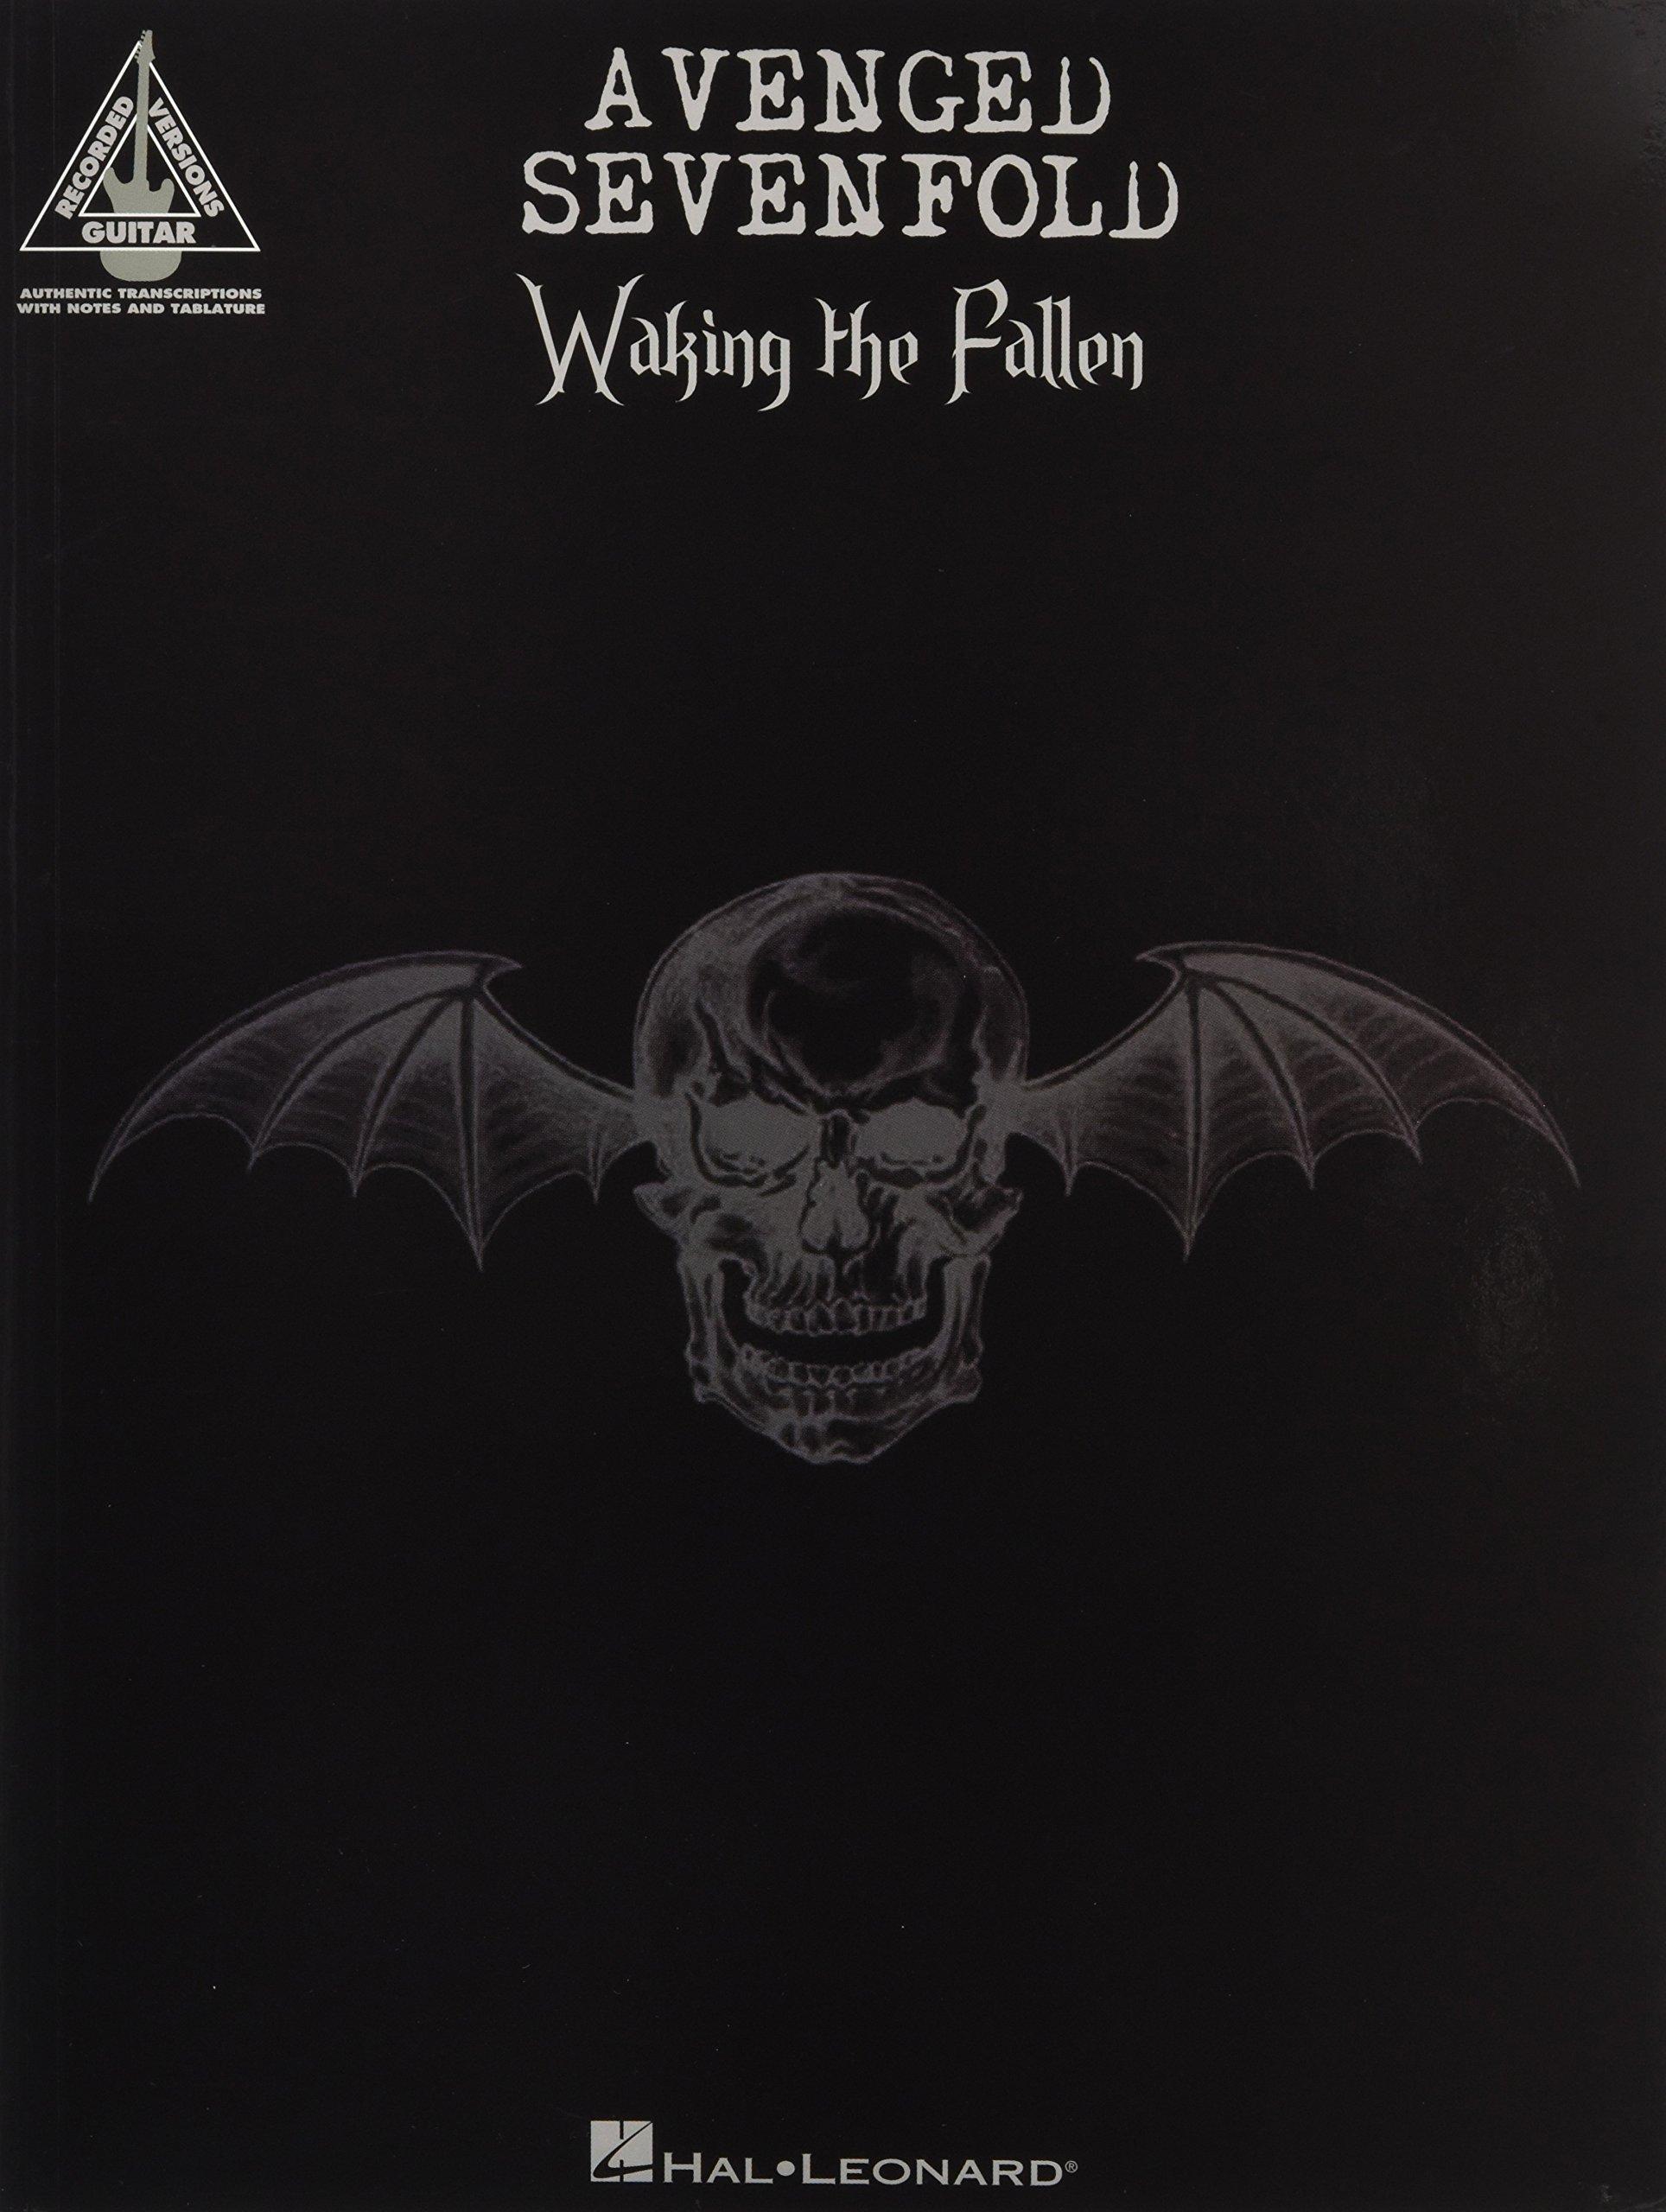 avenged sevenfold waking the fallen album free download